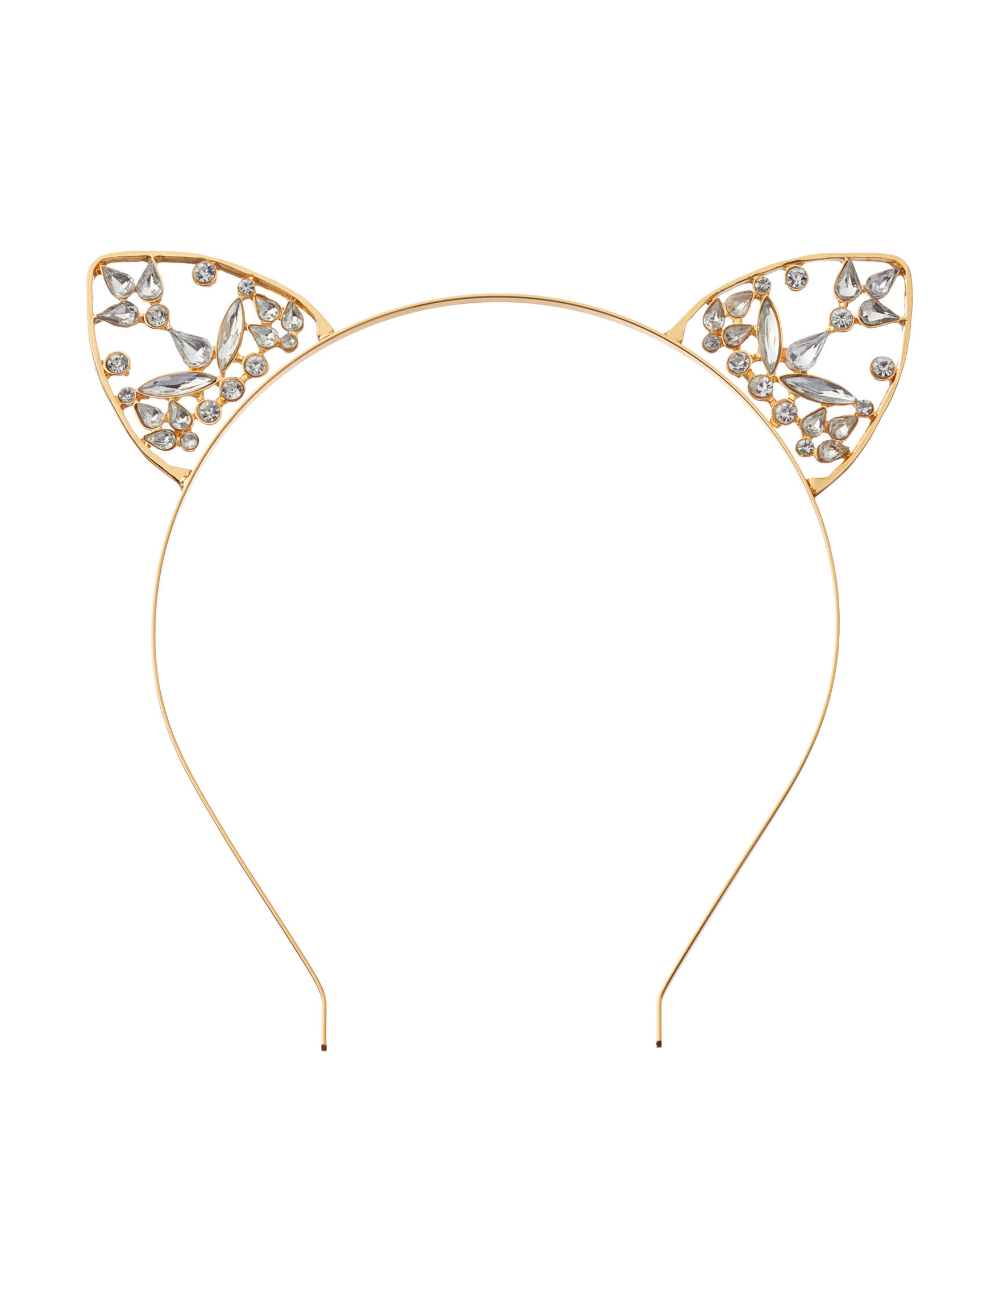 Hannah Embellished Cat Ear Headband Stage Stores Cat Ear Headband Women Accessories Jewelry Ear Headbands